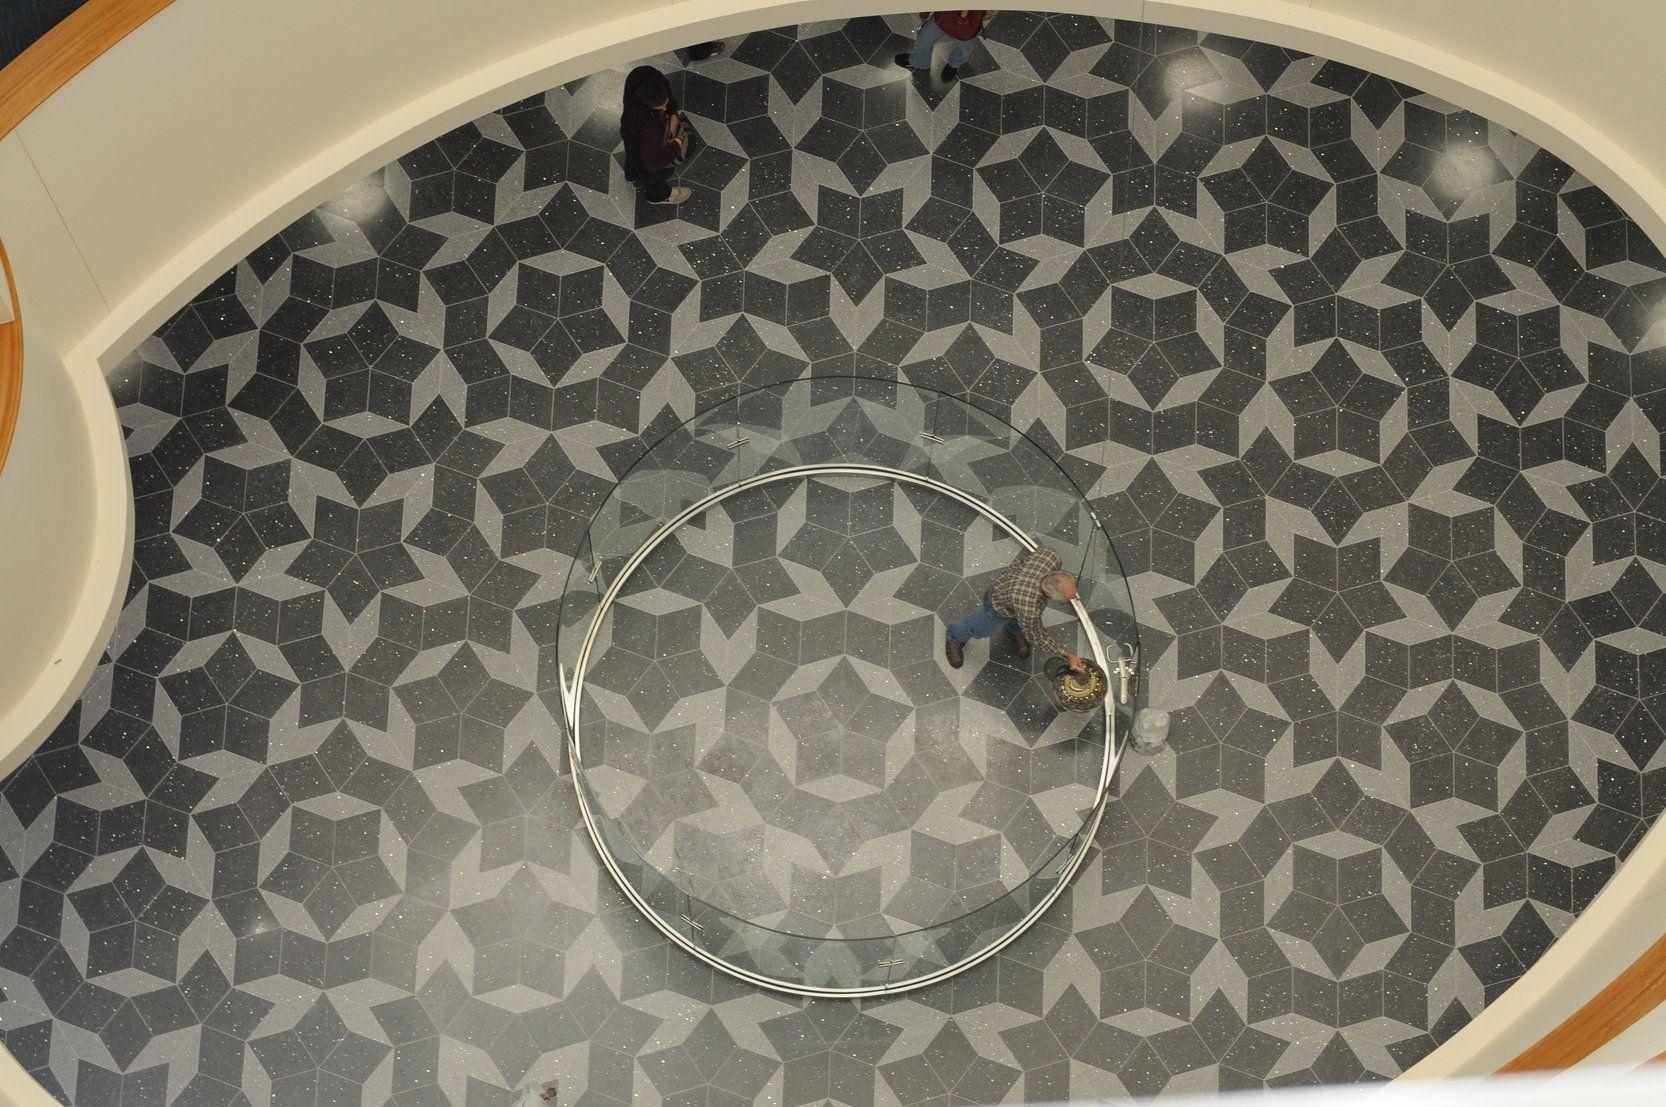 Penrose tiling of a finite plane mind games penrosen arabic penrose tiling of a finite plane dailygadgetfo Images